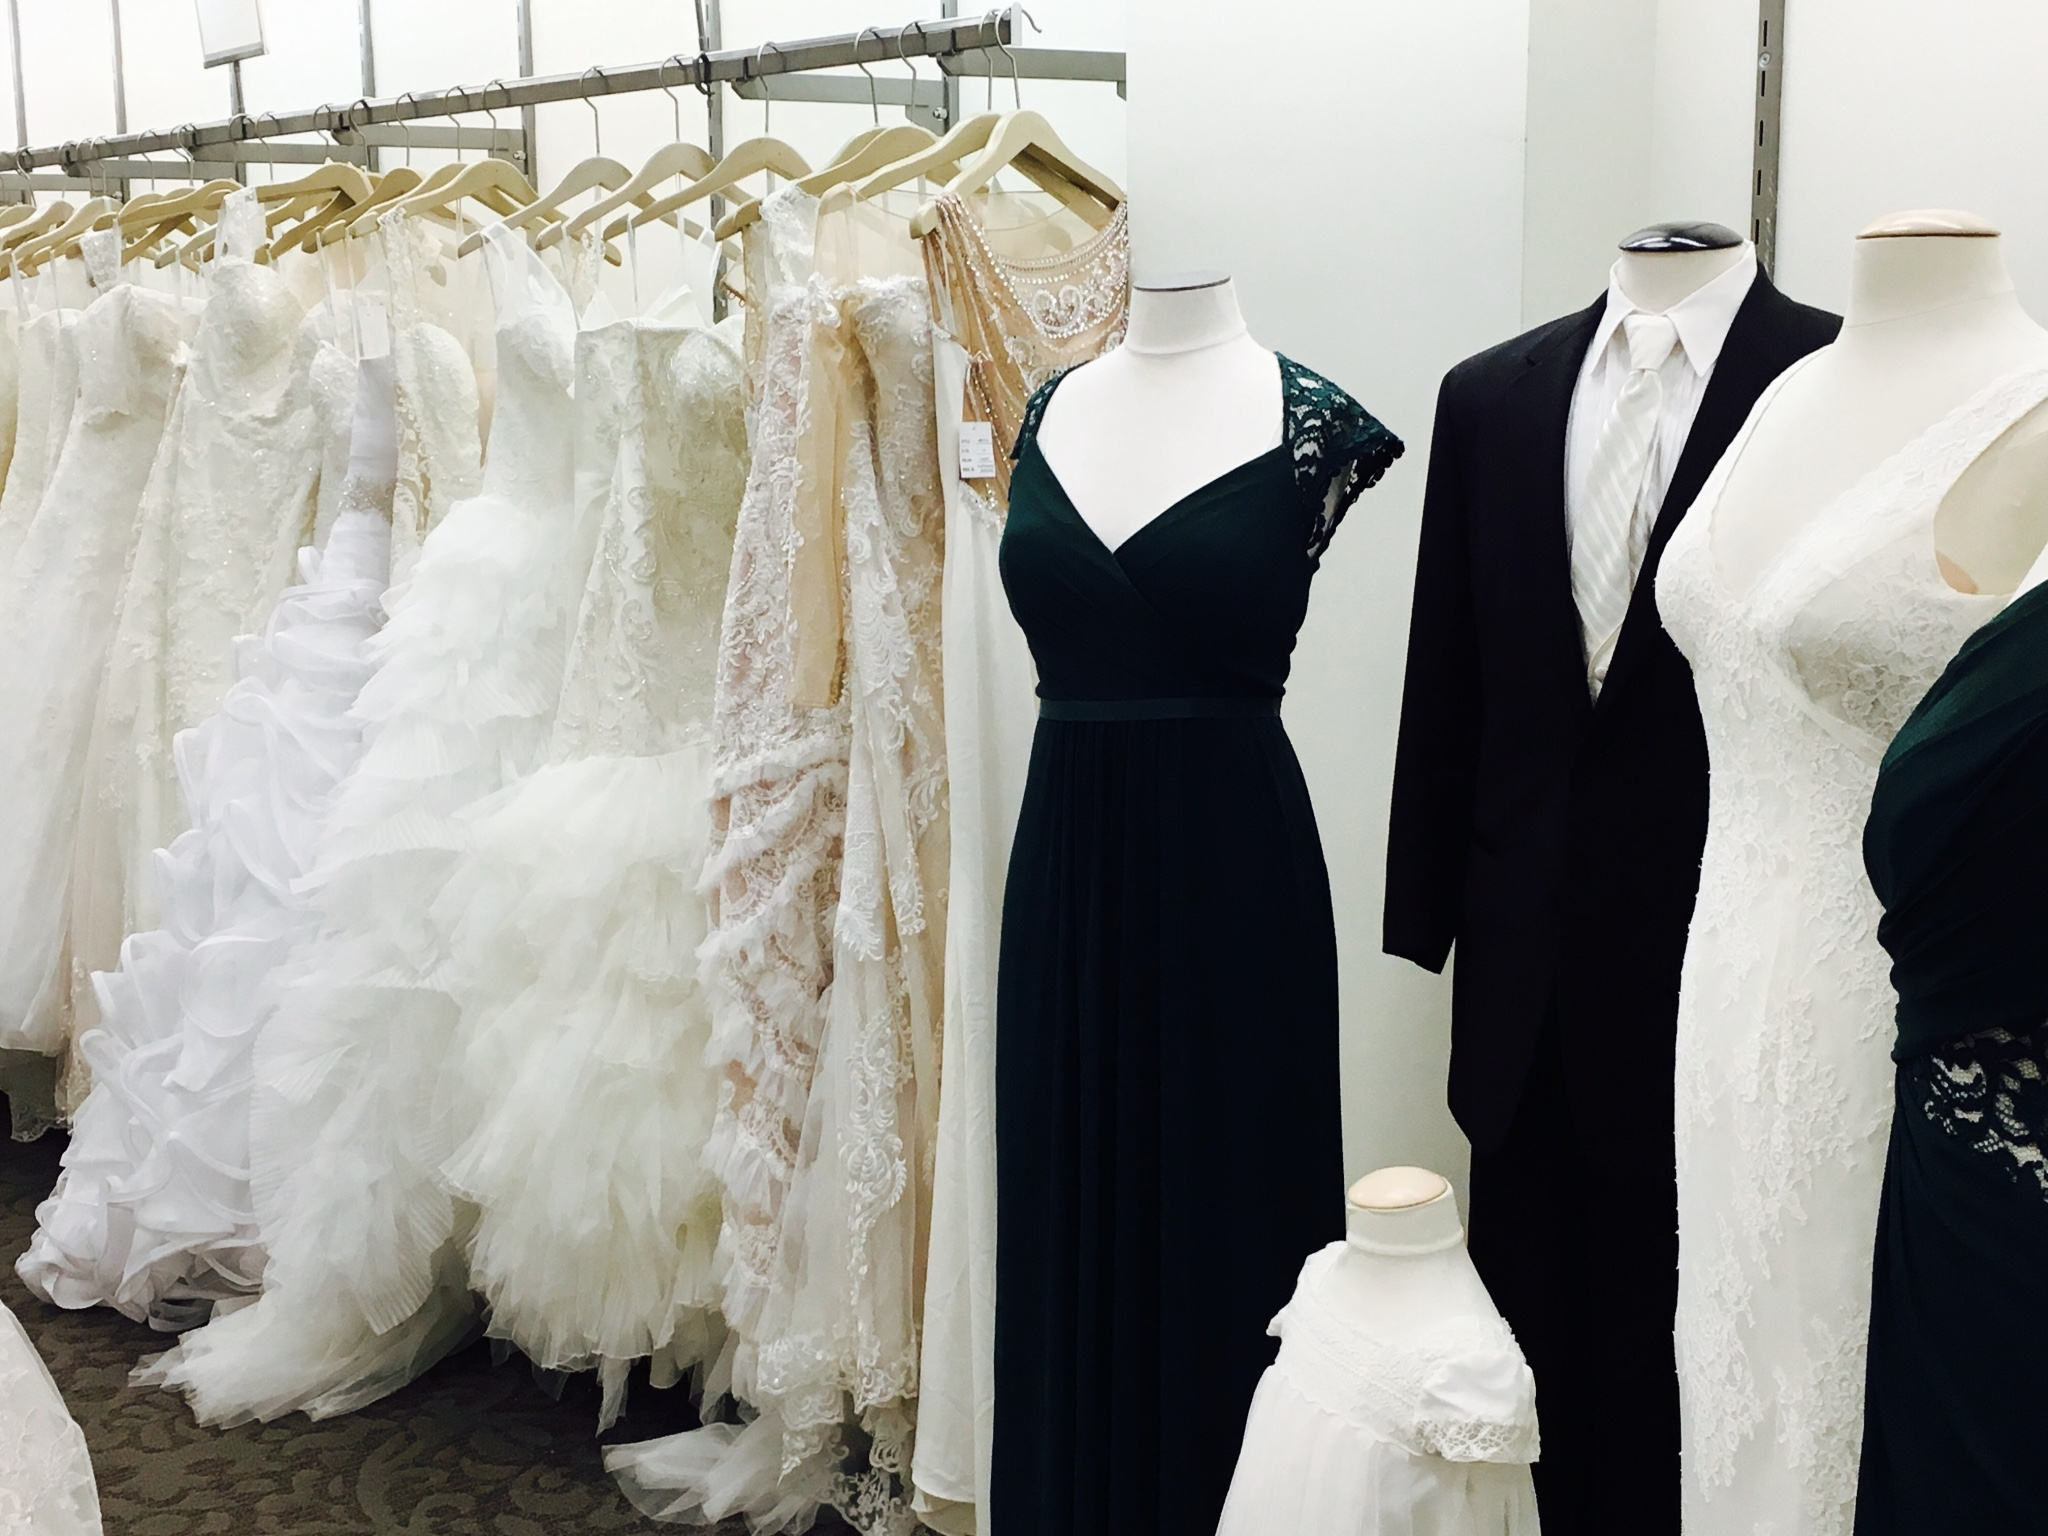 wedding dress preservation asheville nc wedding dress preservation Wedding Dress Alterations Greenville Nc Gown Dresses